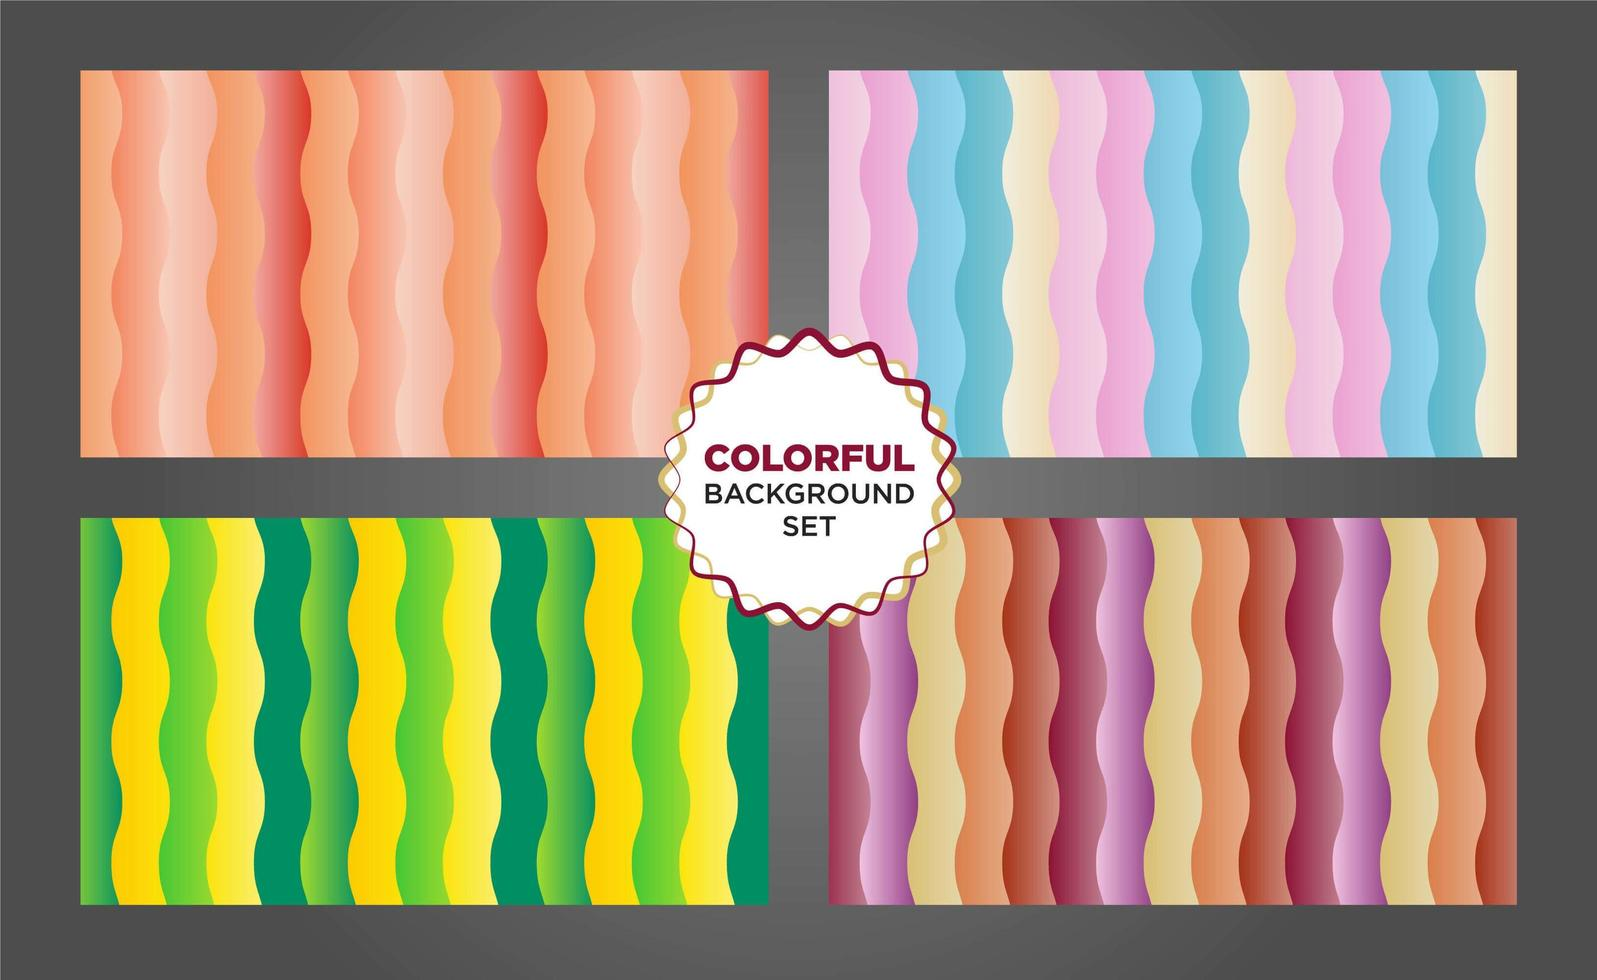 kleurrijke verticale golvende vorm achtergrond instellen vector